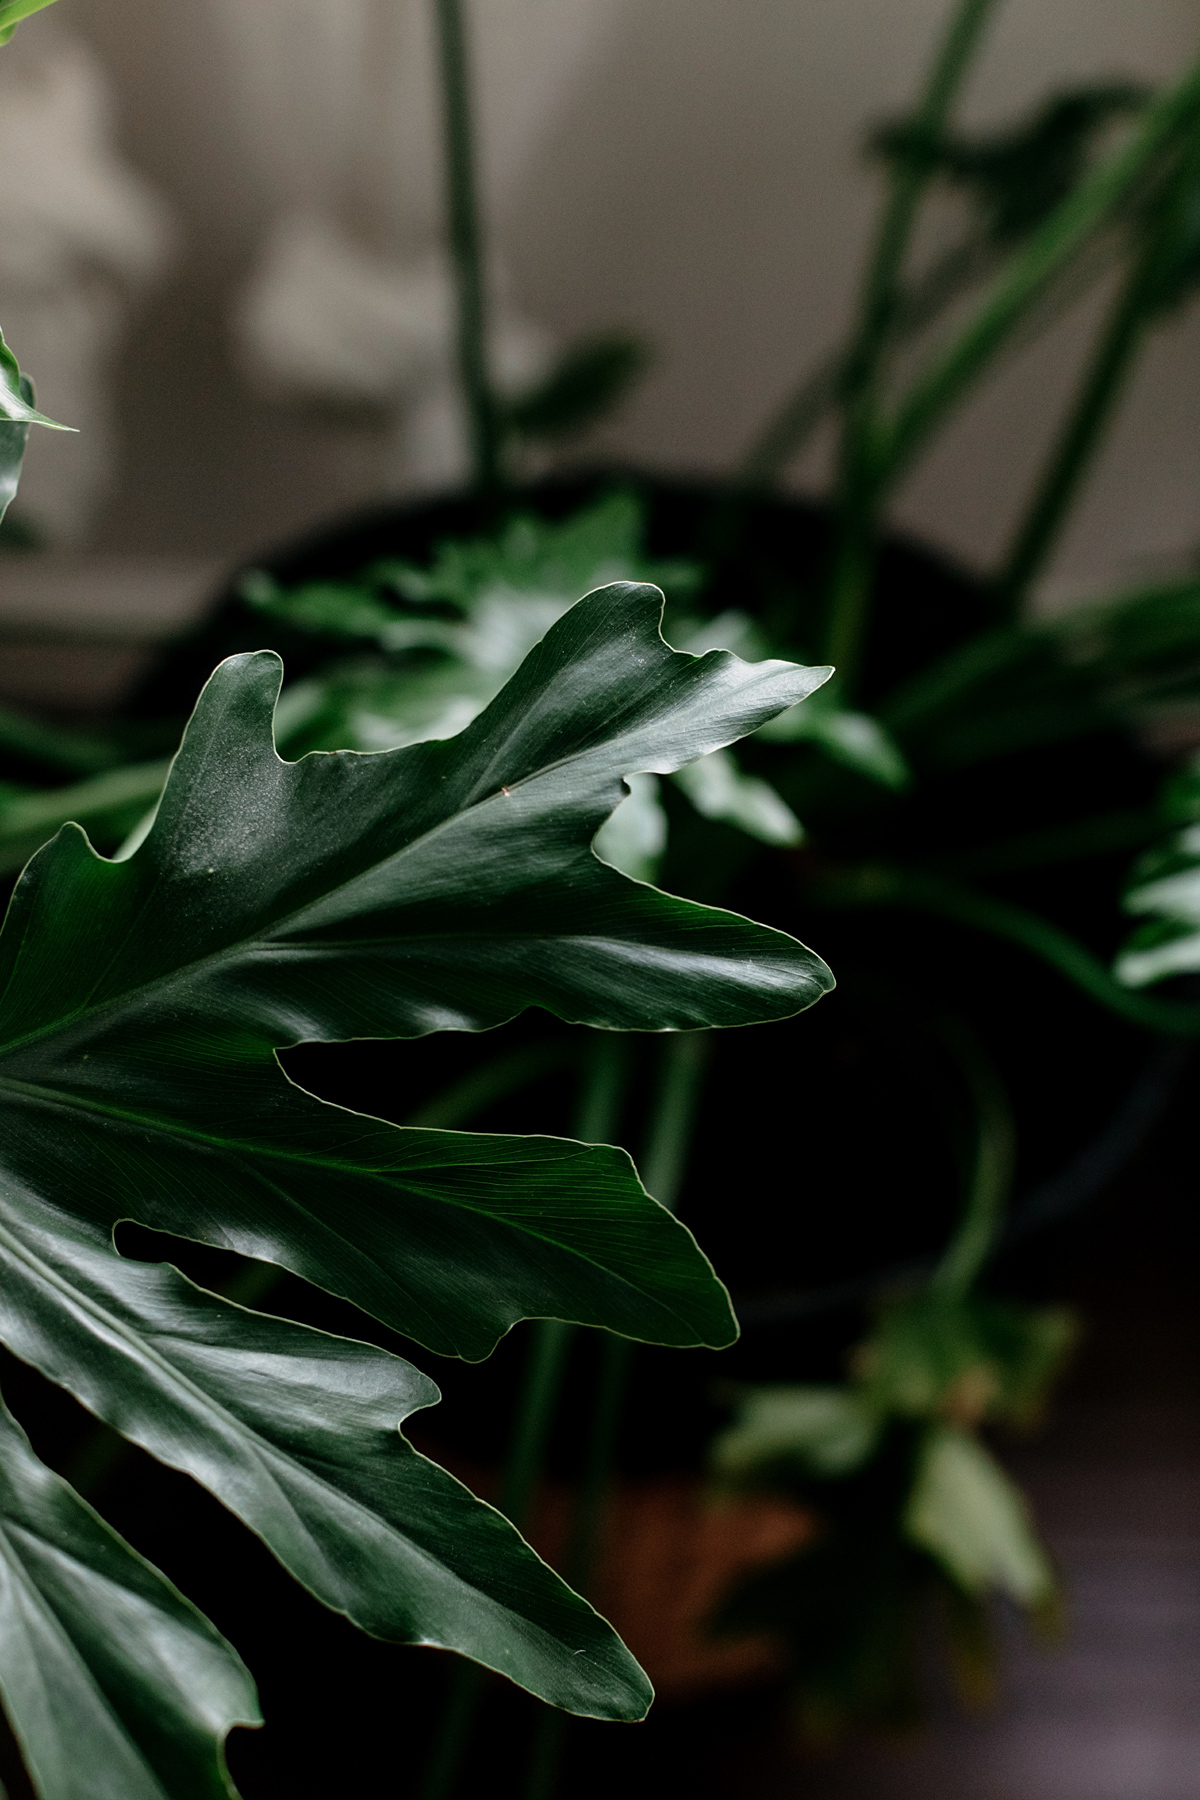 027-plant--plant-addict--blogger--interior-blogger--interio--home-blogger--lifestyle--lifestlye-blogger--tropical--urban-jungle.jpg